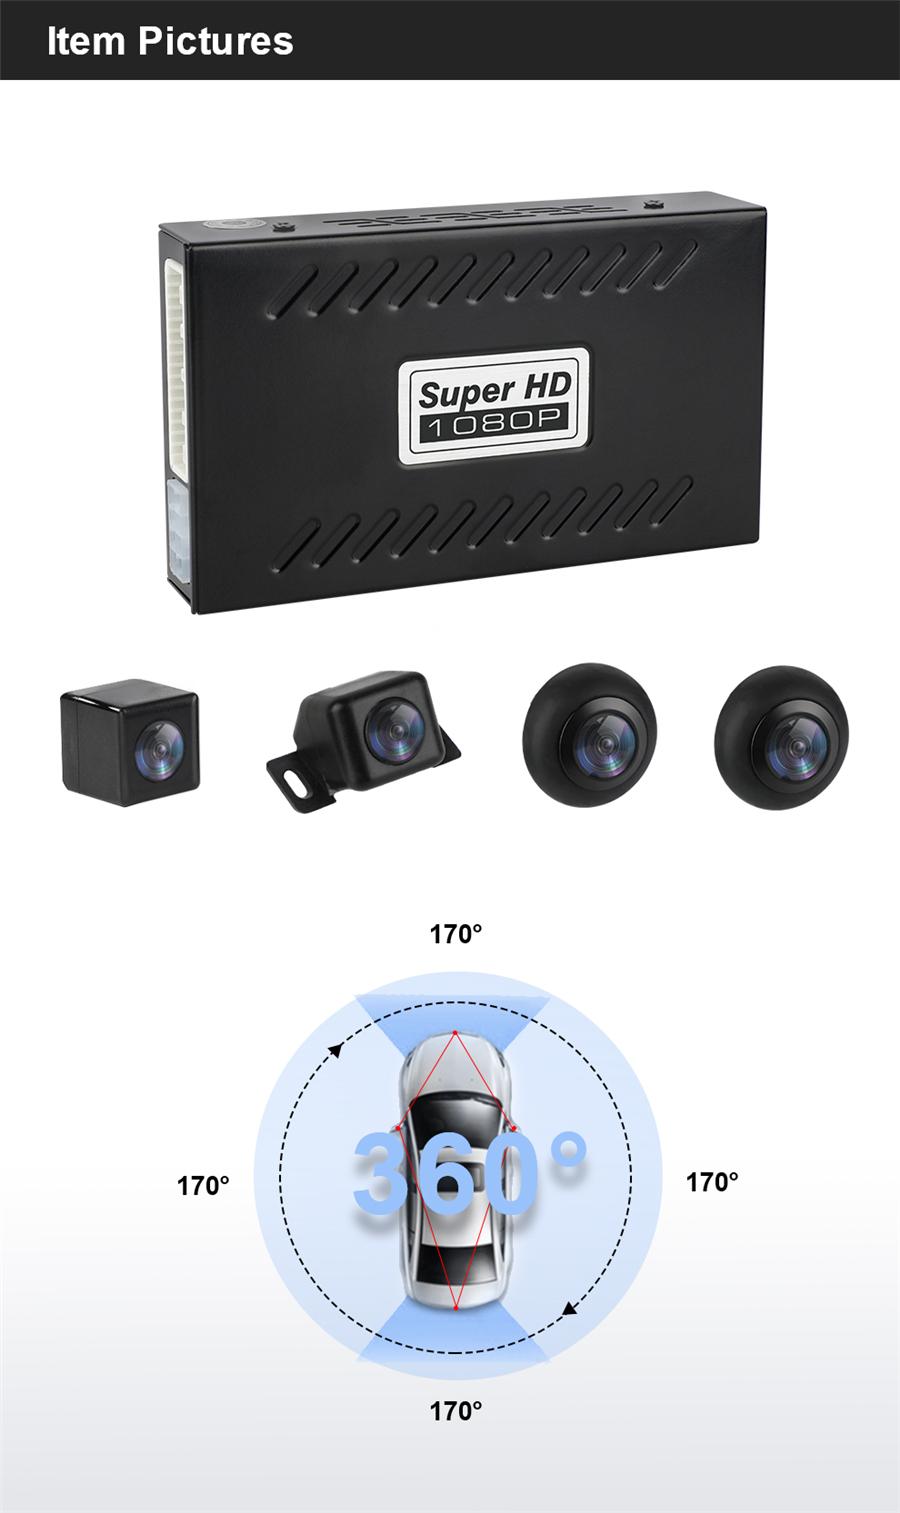 New Car 360° HD DVR Bird View Panoramic System w//Seamless 4 Camera/&Shock Sensor/&